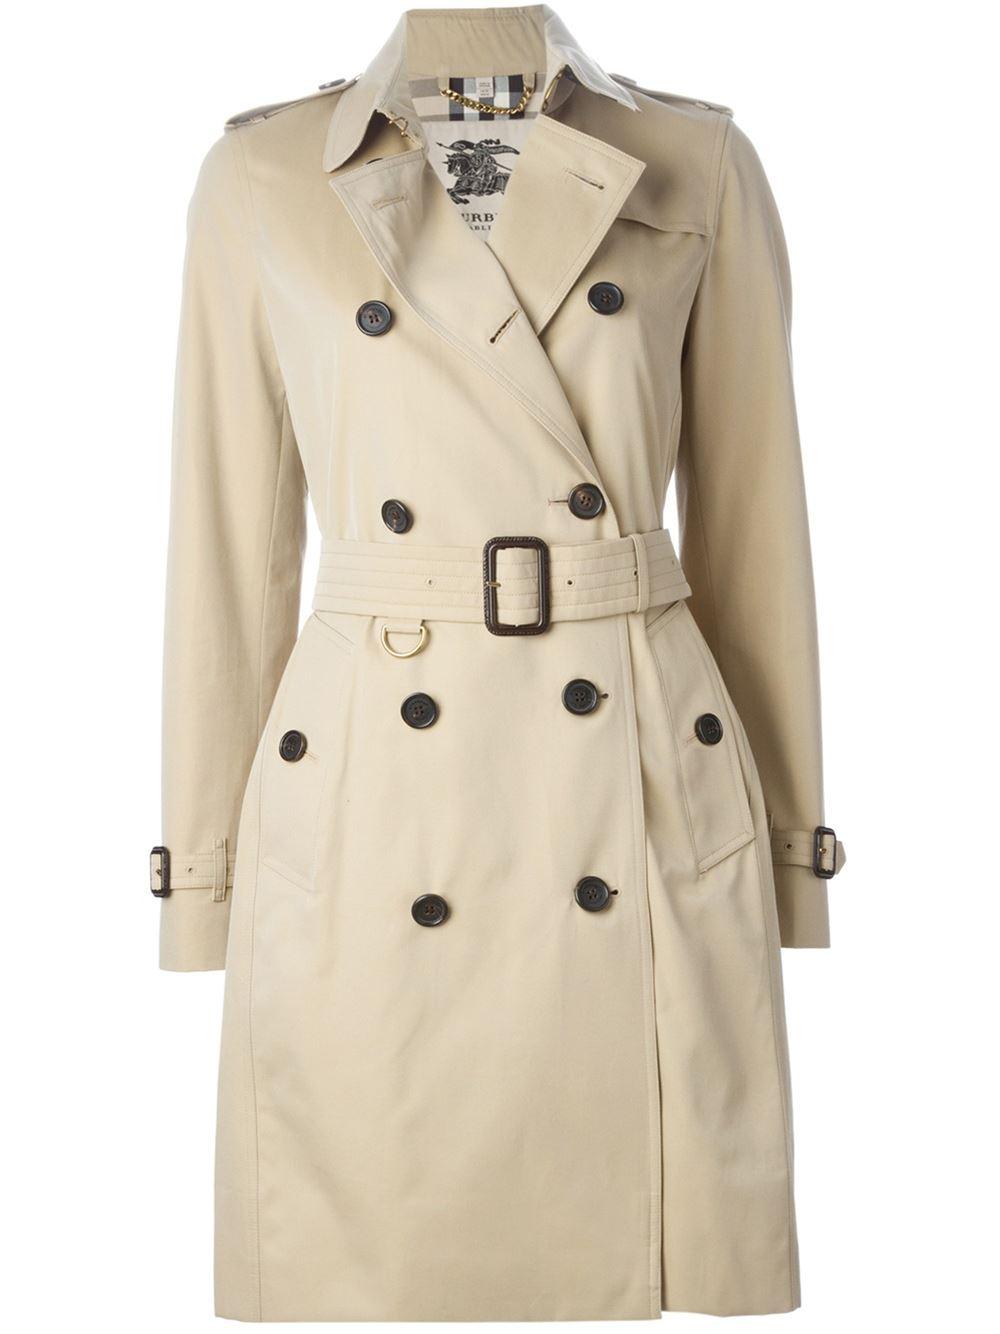 burberry 39 kensington 39 belted trench coat in beige nude. Black Bedroom Furniture Sets. Home Design Ideas